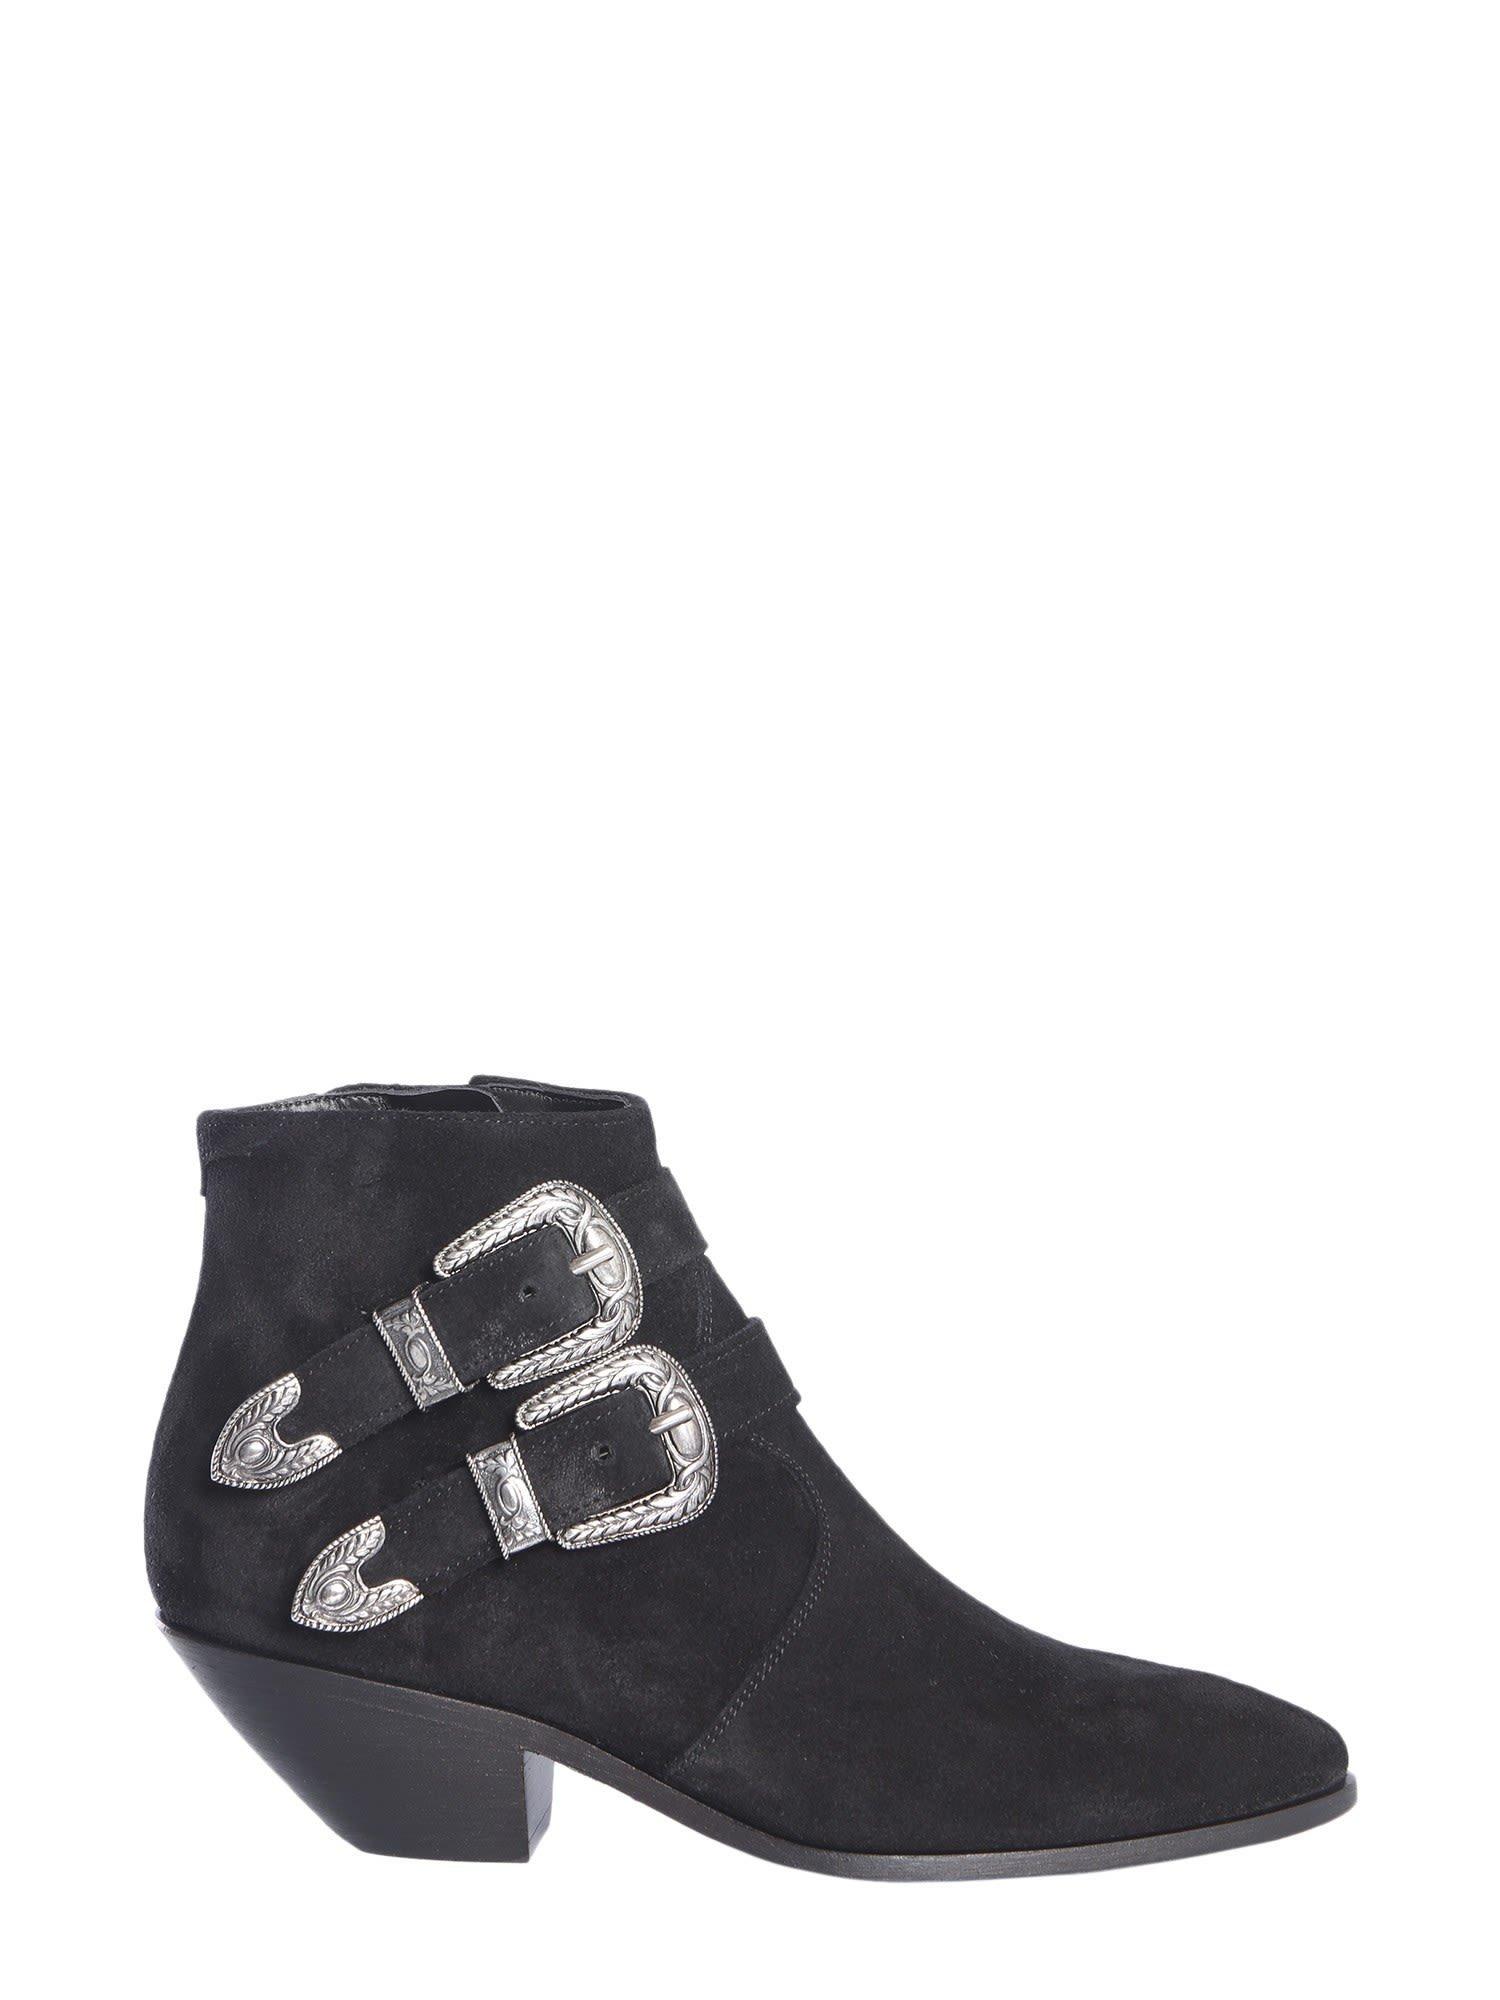 Saint Laurent Texano Boots